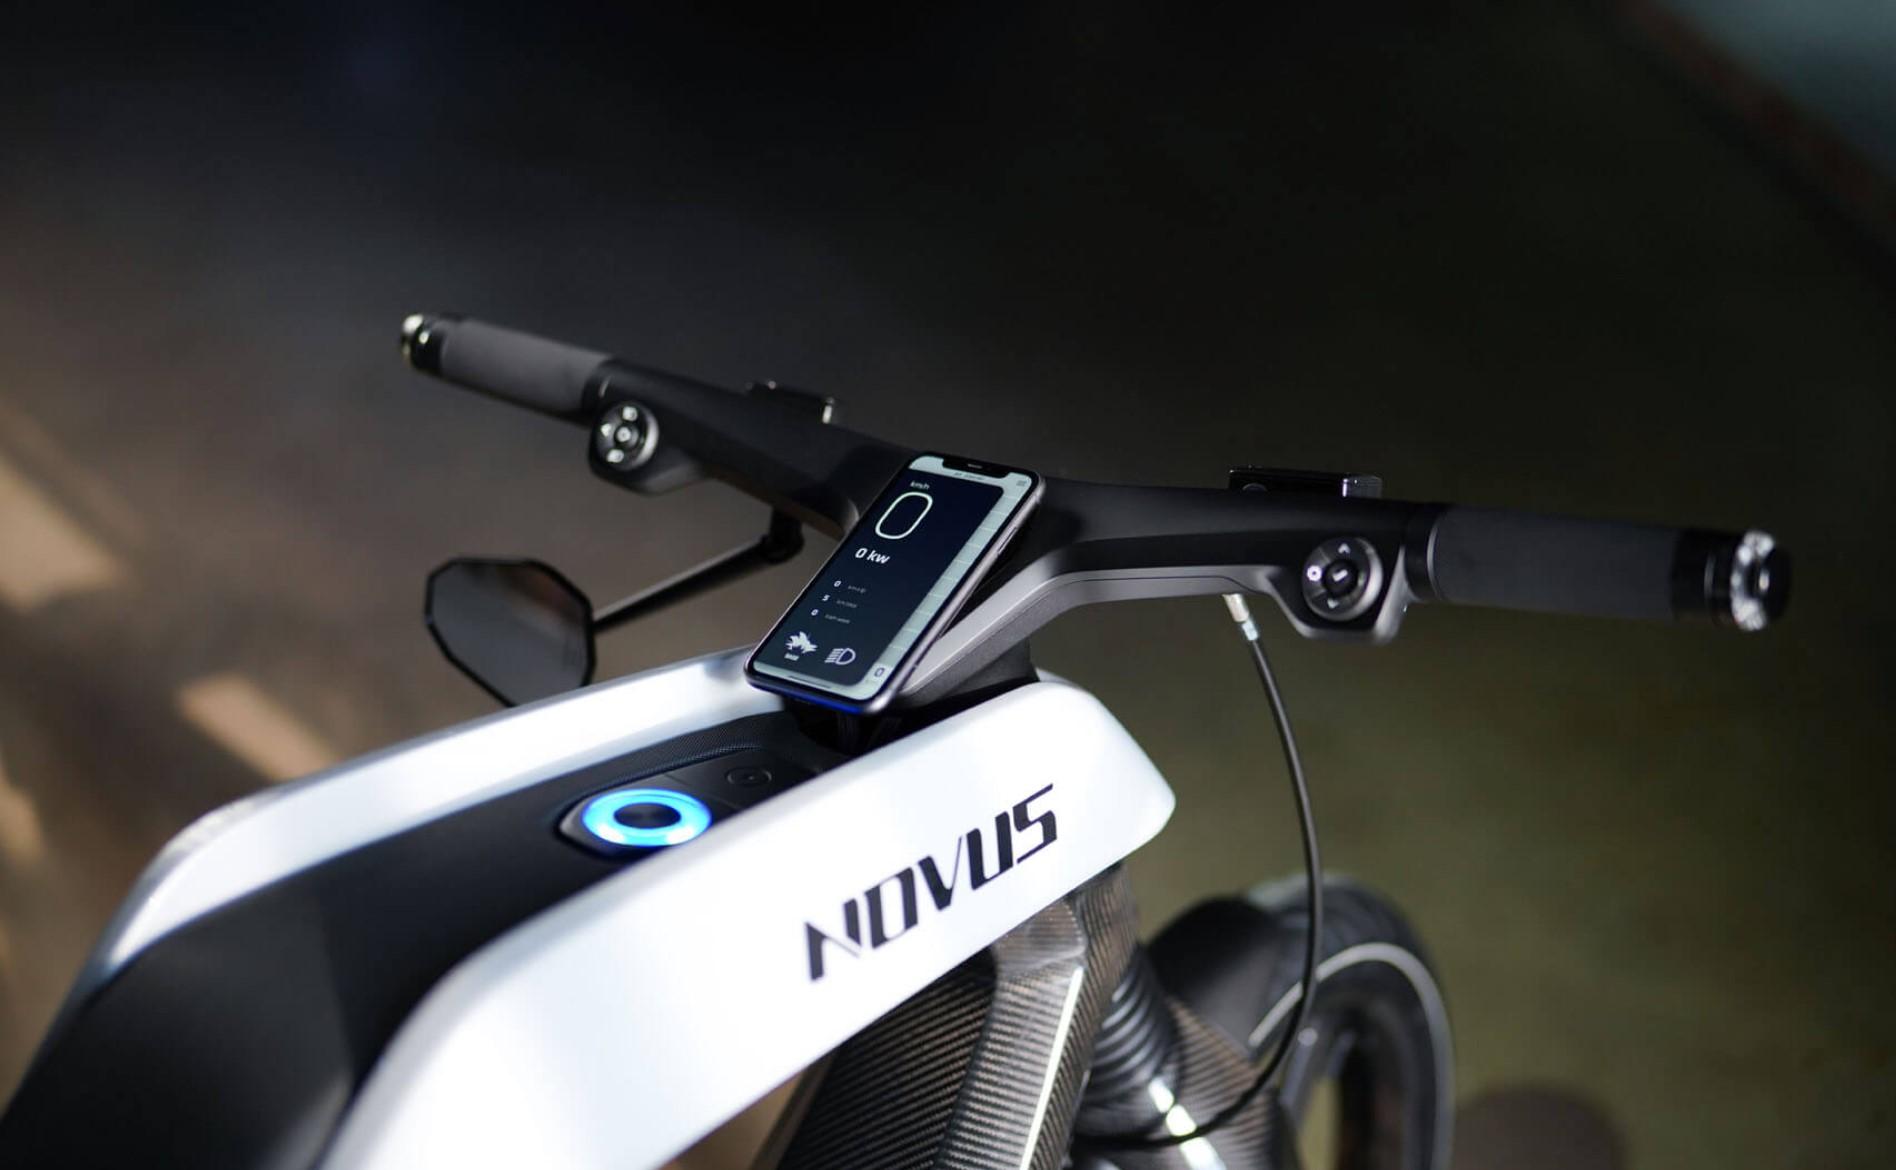 Novus Electric Bike Smartphone App